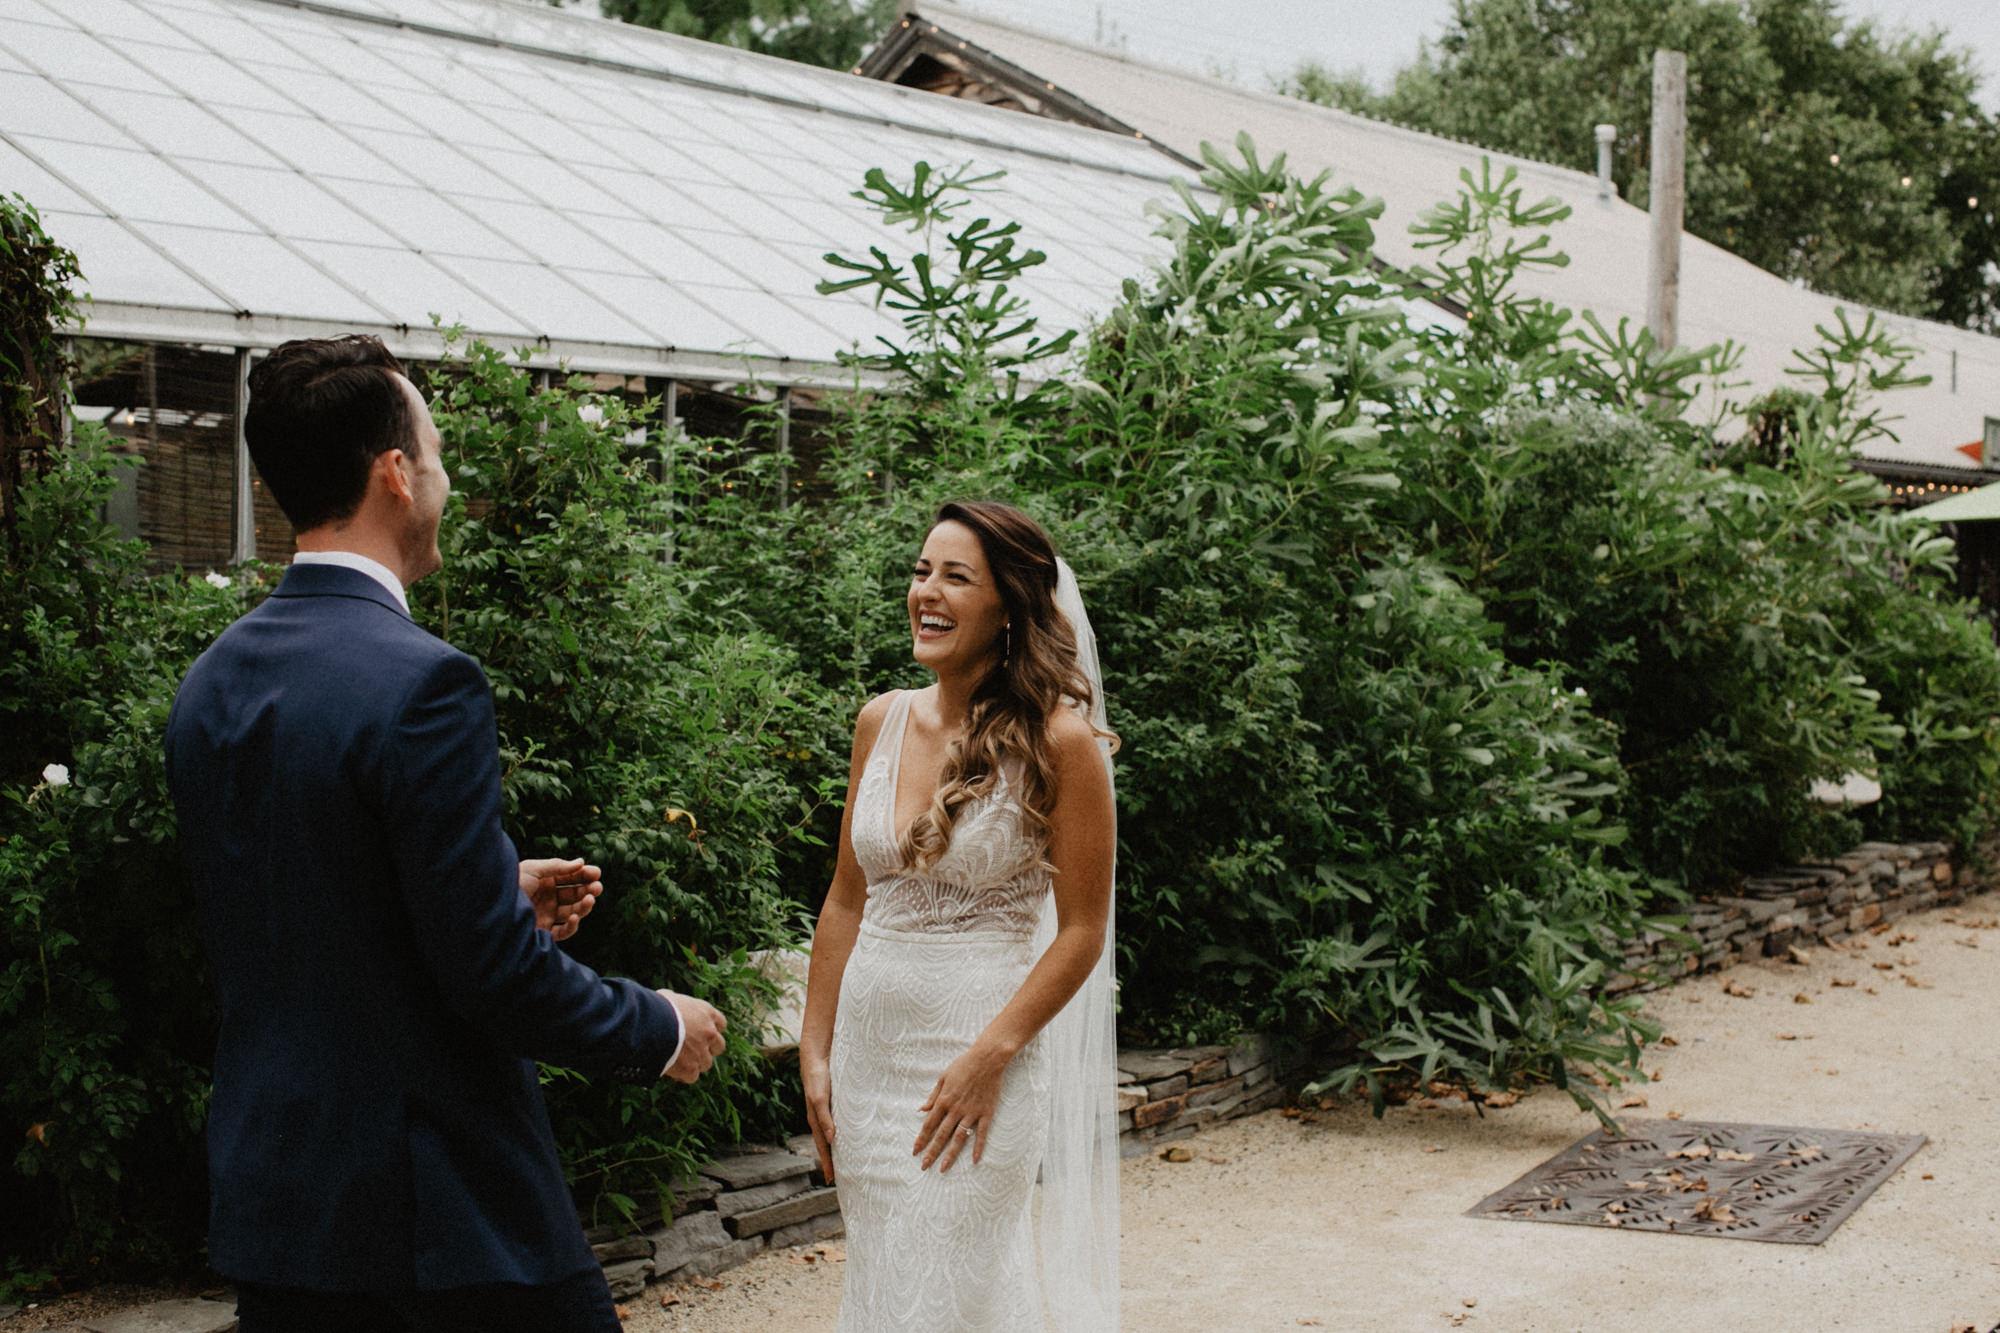 terrain-events-wedding-photographer-21.jpg